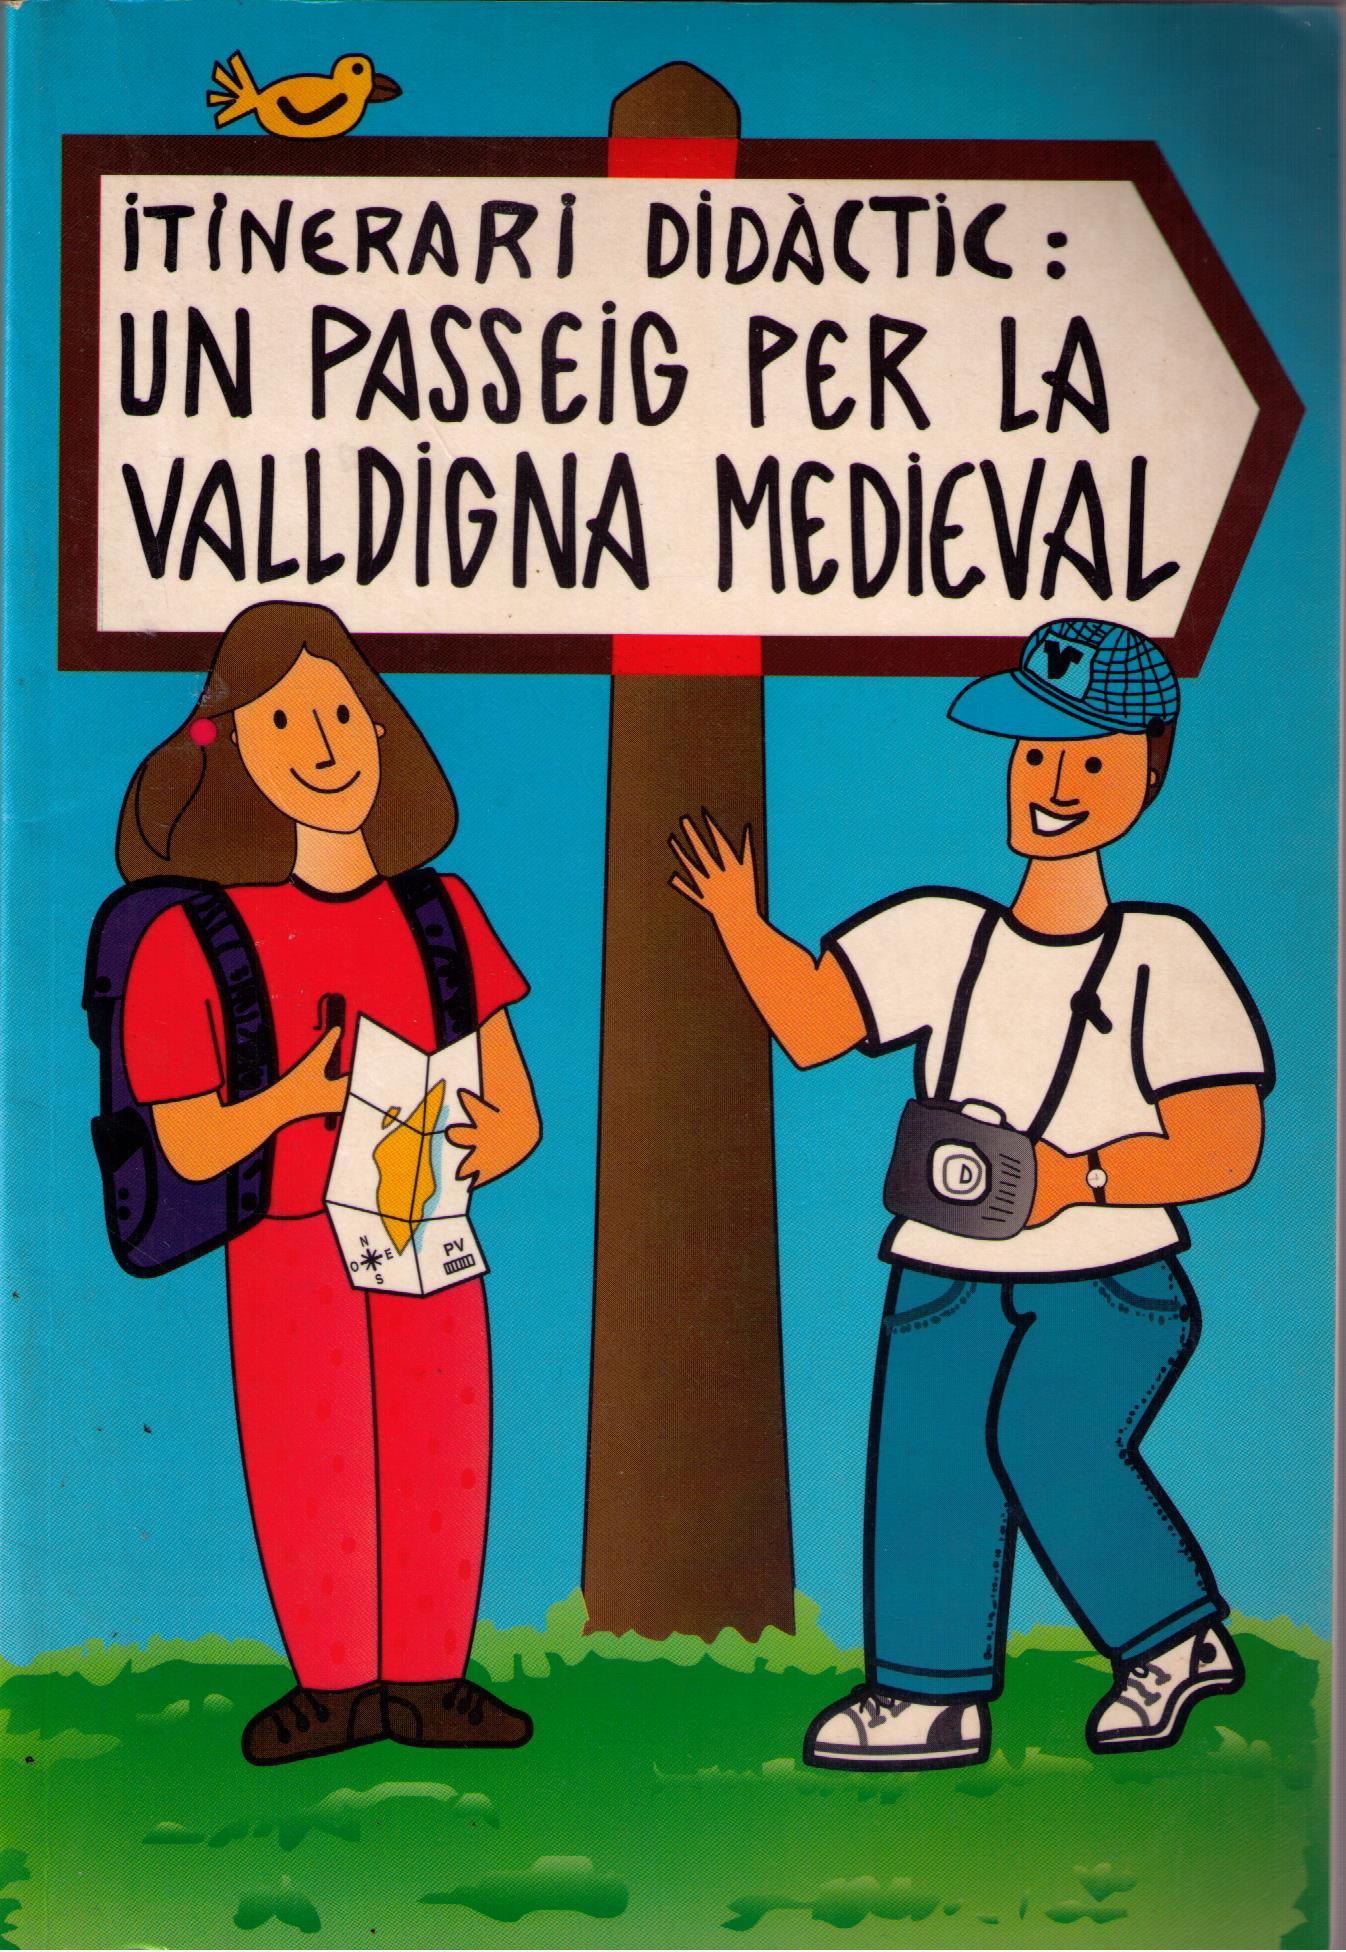 Itinerari didàctic: Un passeig per la Valldigna medieval